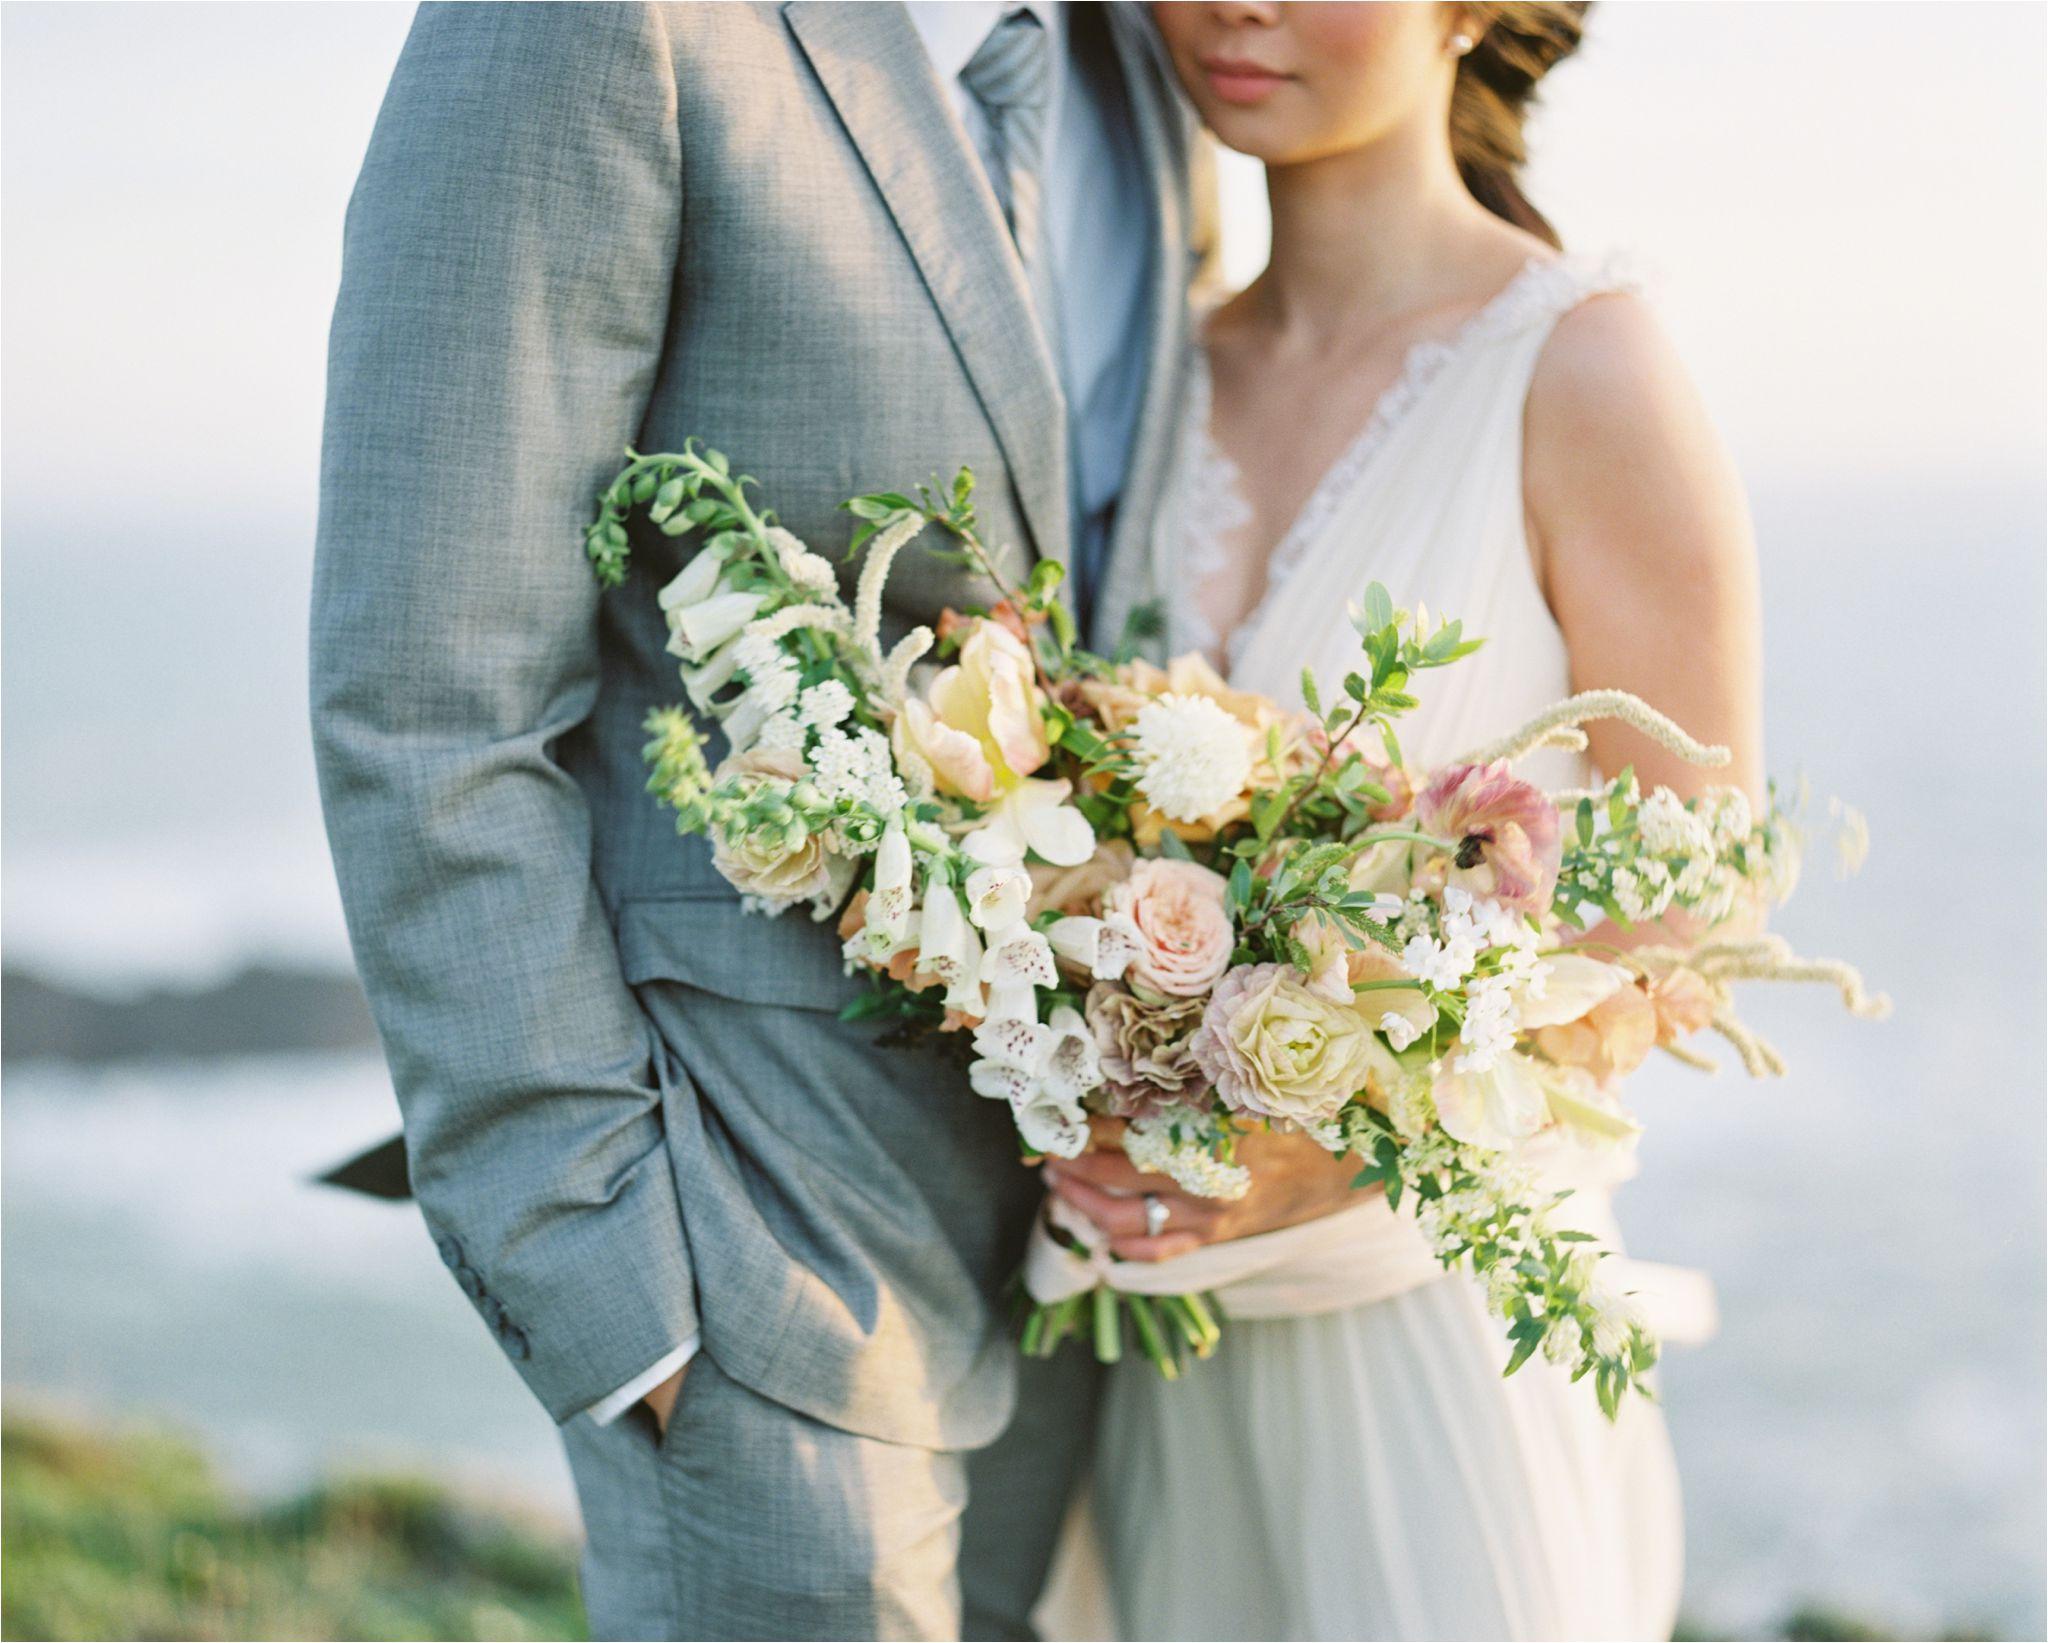 california_coast_mendicino_cuffeyscoveranch_wedding_elopement_photography00056.jpg